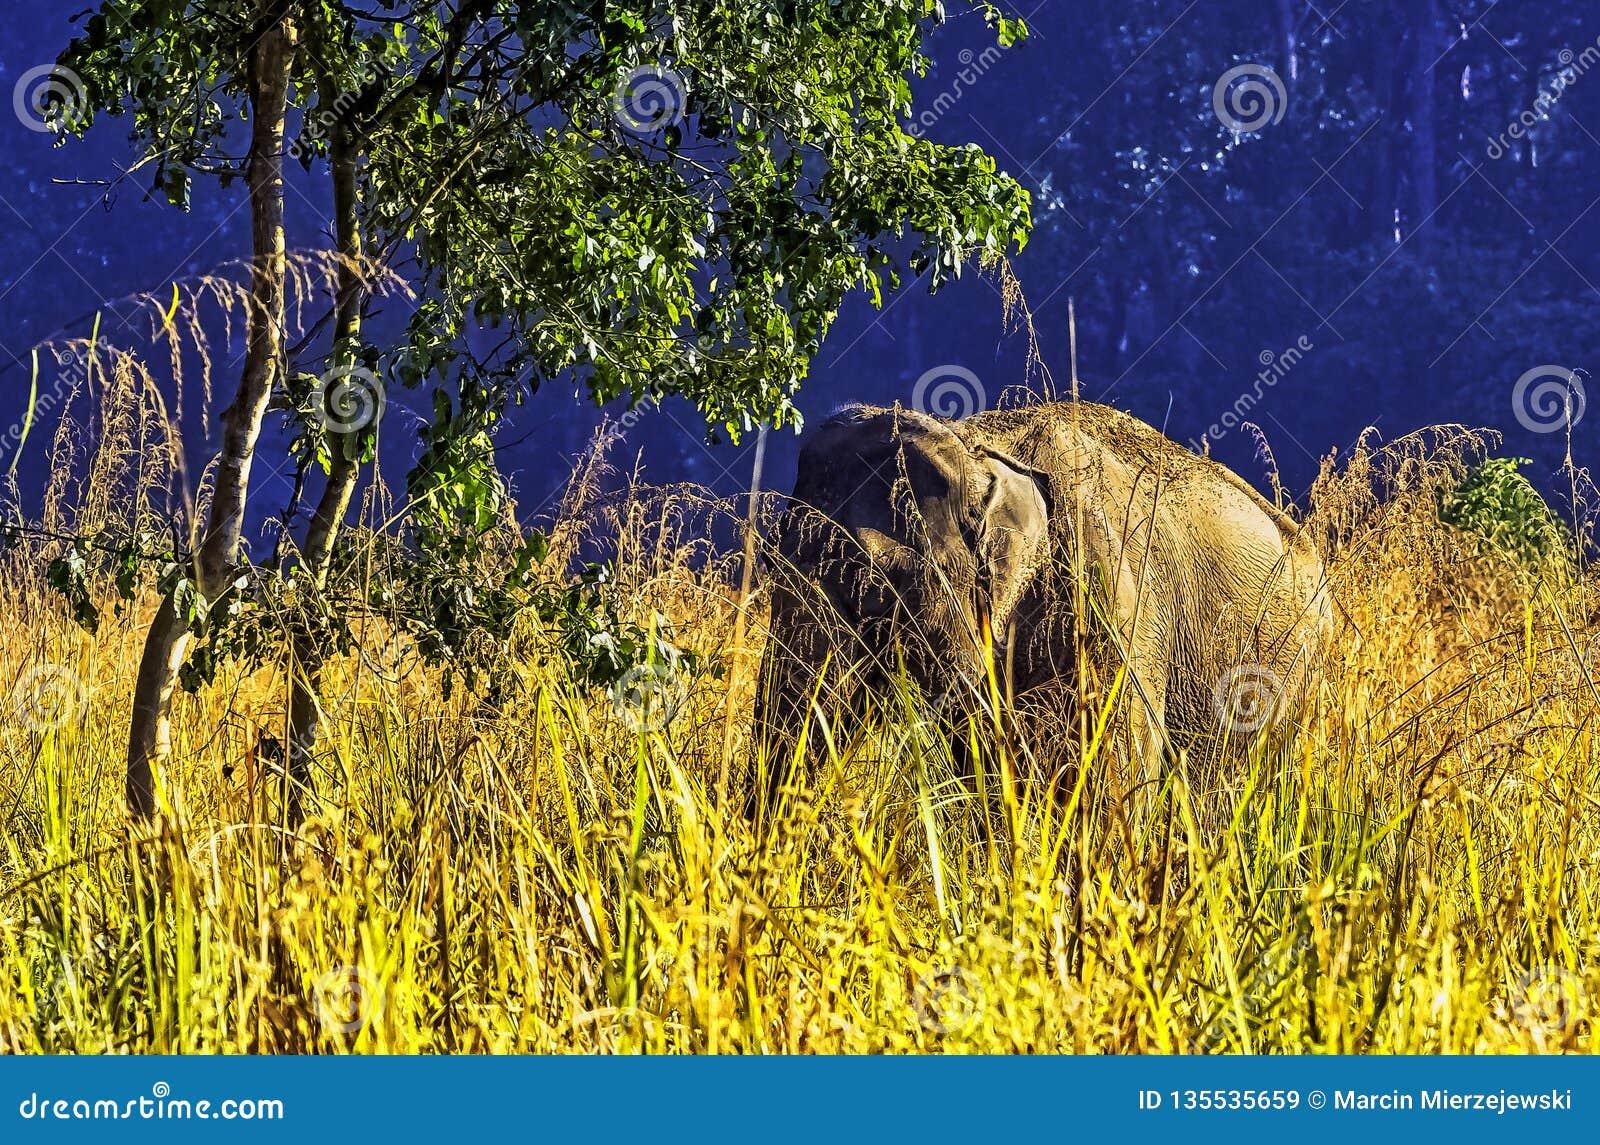 Indian elephant hidden in the bush - Jim Corbett National Park, India